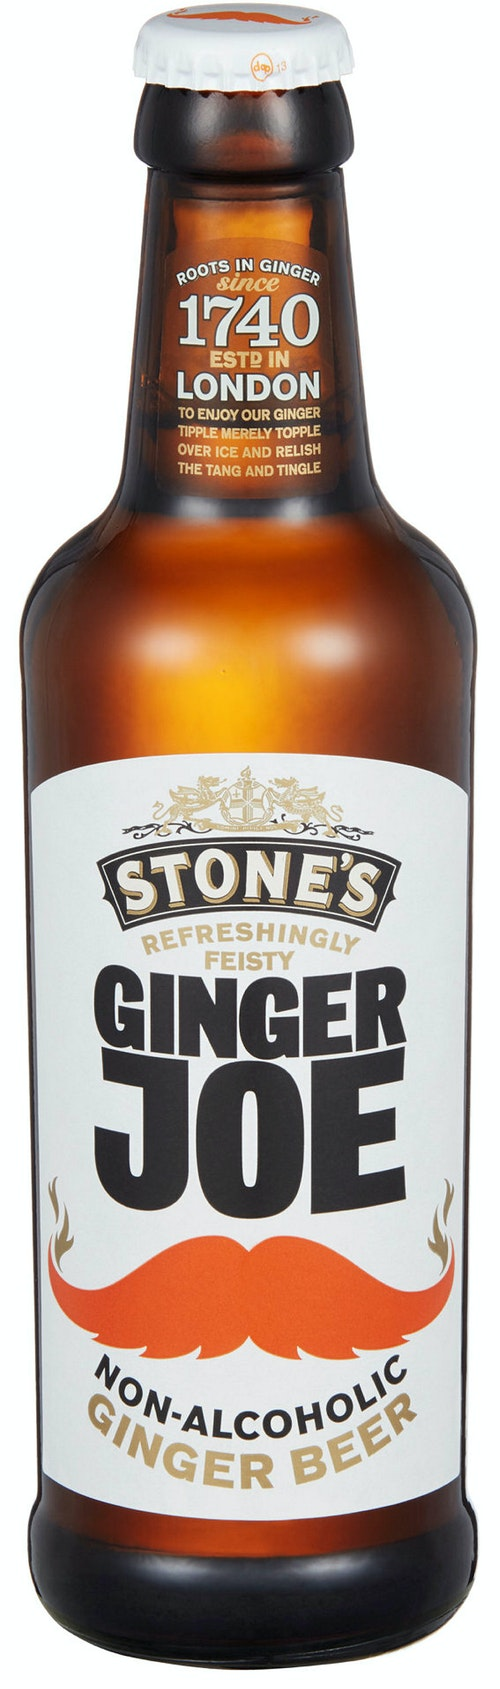 Ginger Joe Alkoholfri, 0,33 l